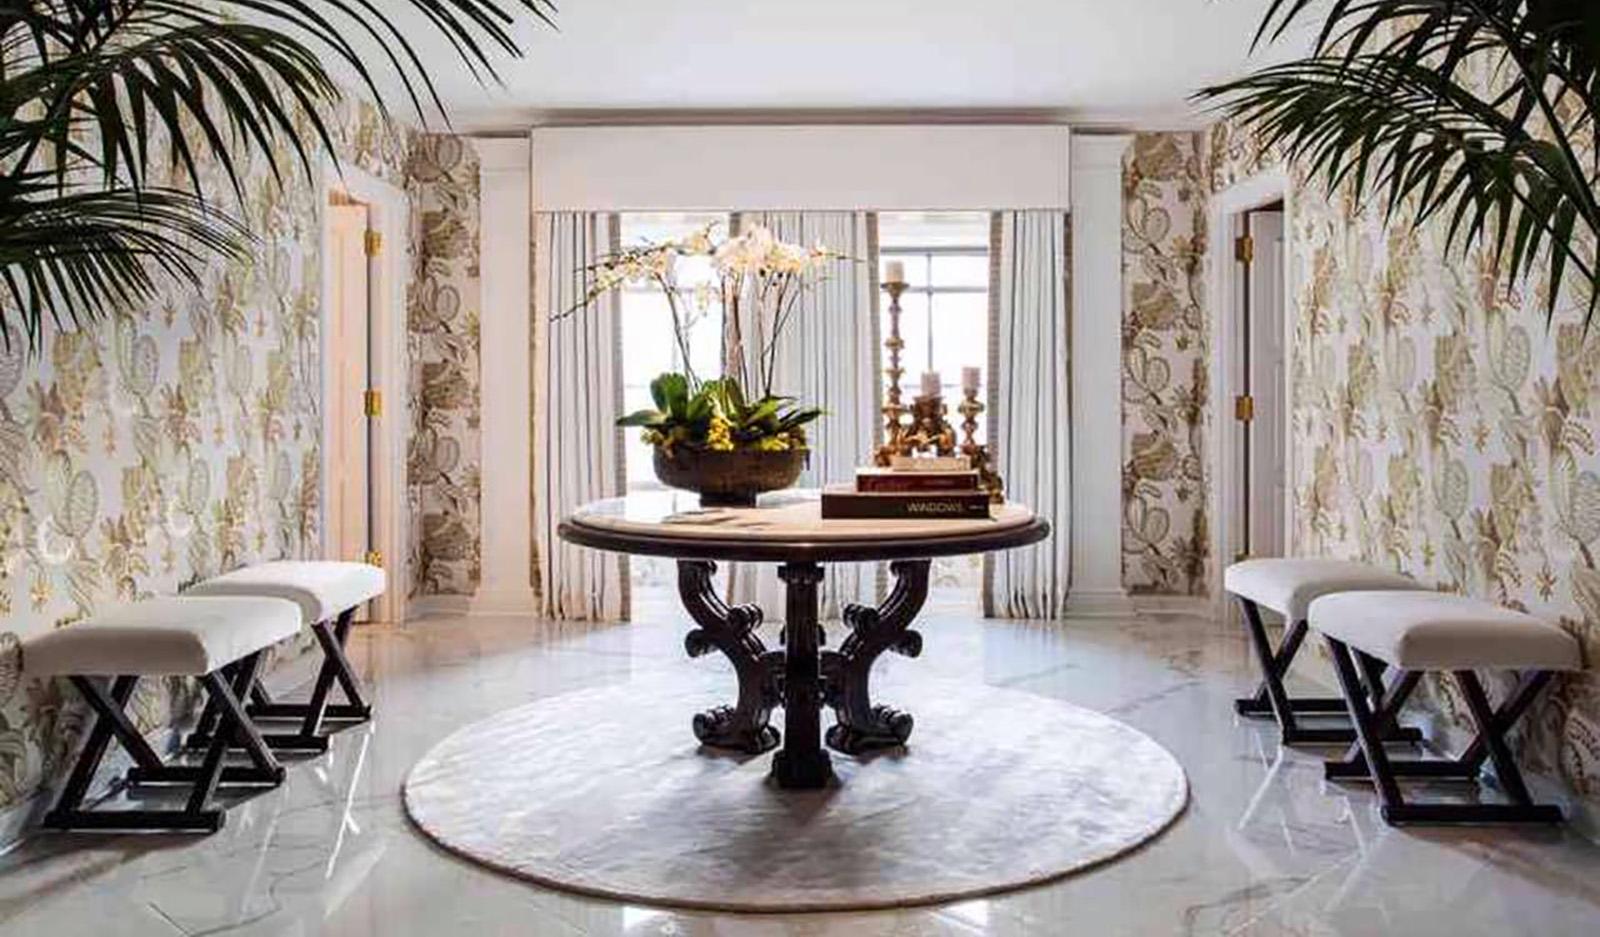 Majestic Residential Myron Wolman Designs 10